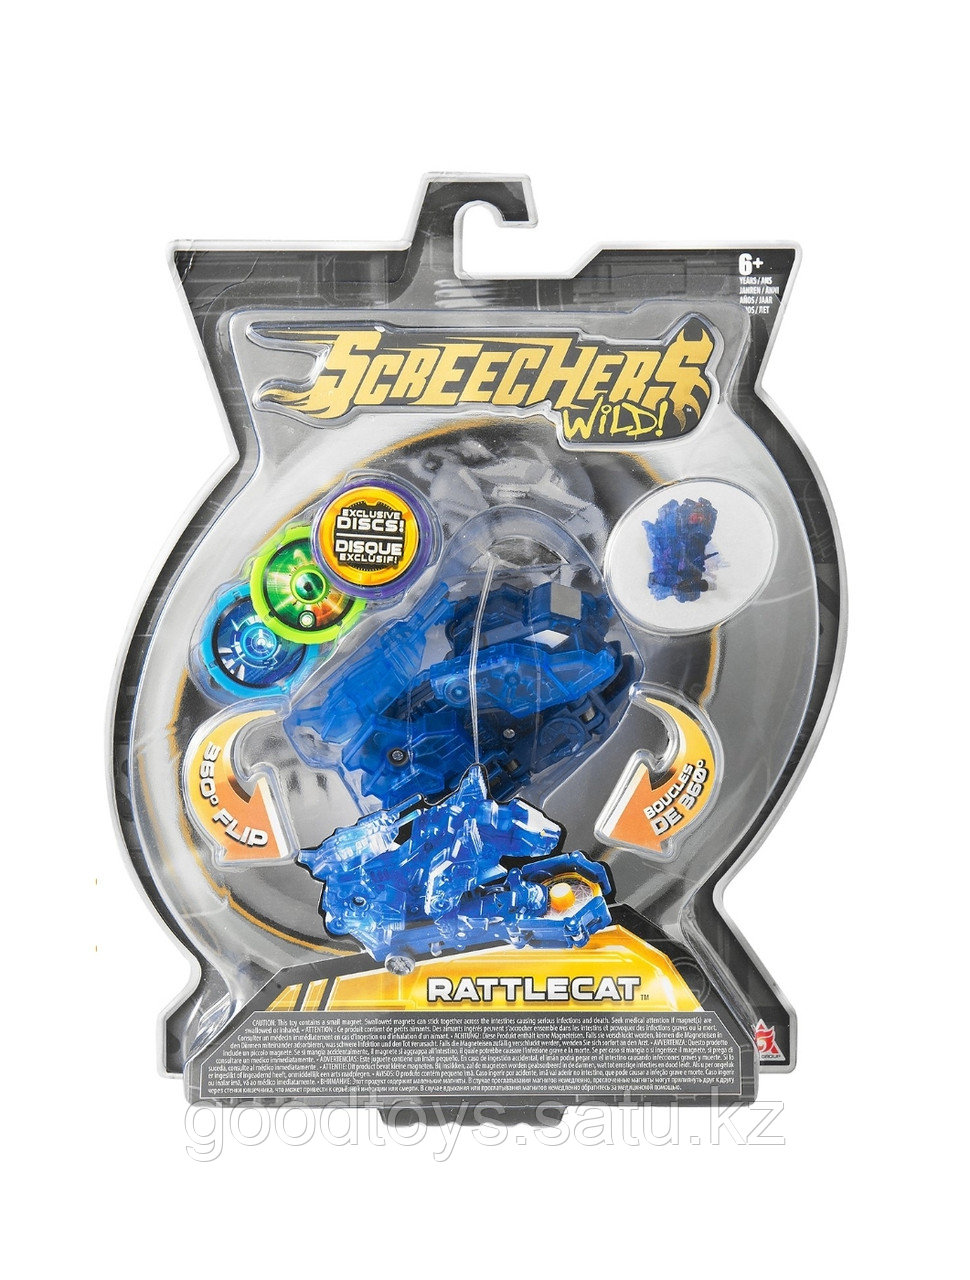 Screechers wild. Rattlecat игрушка трансформер дикие скричеры